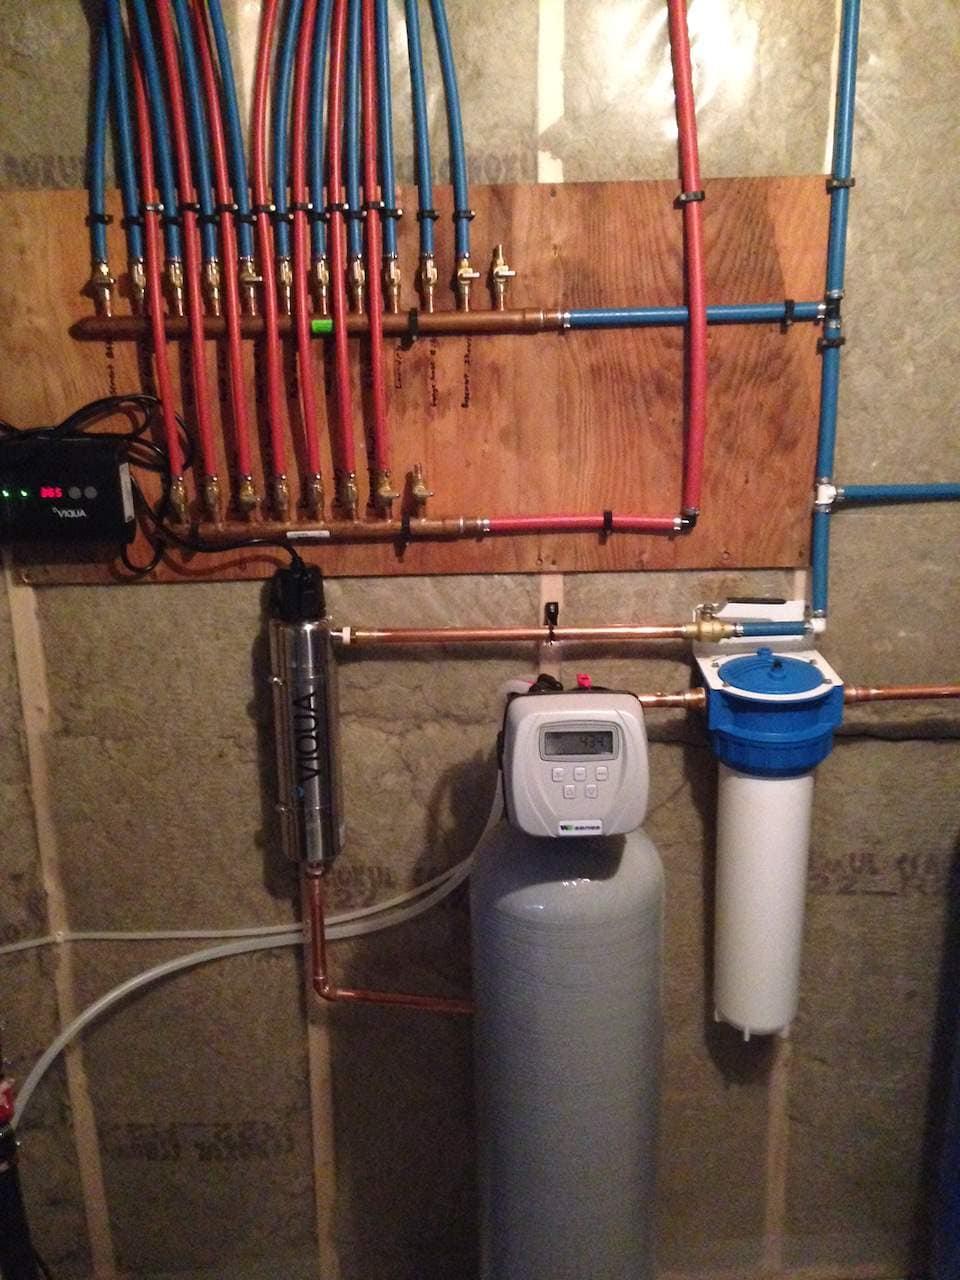 Organized plumbing in the basement